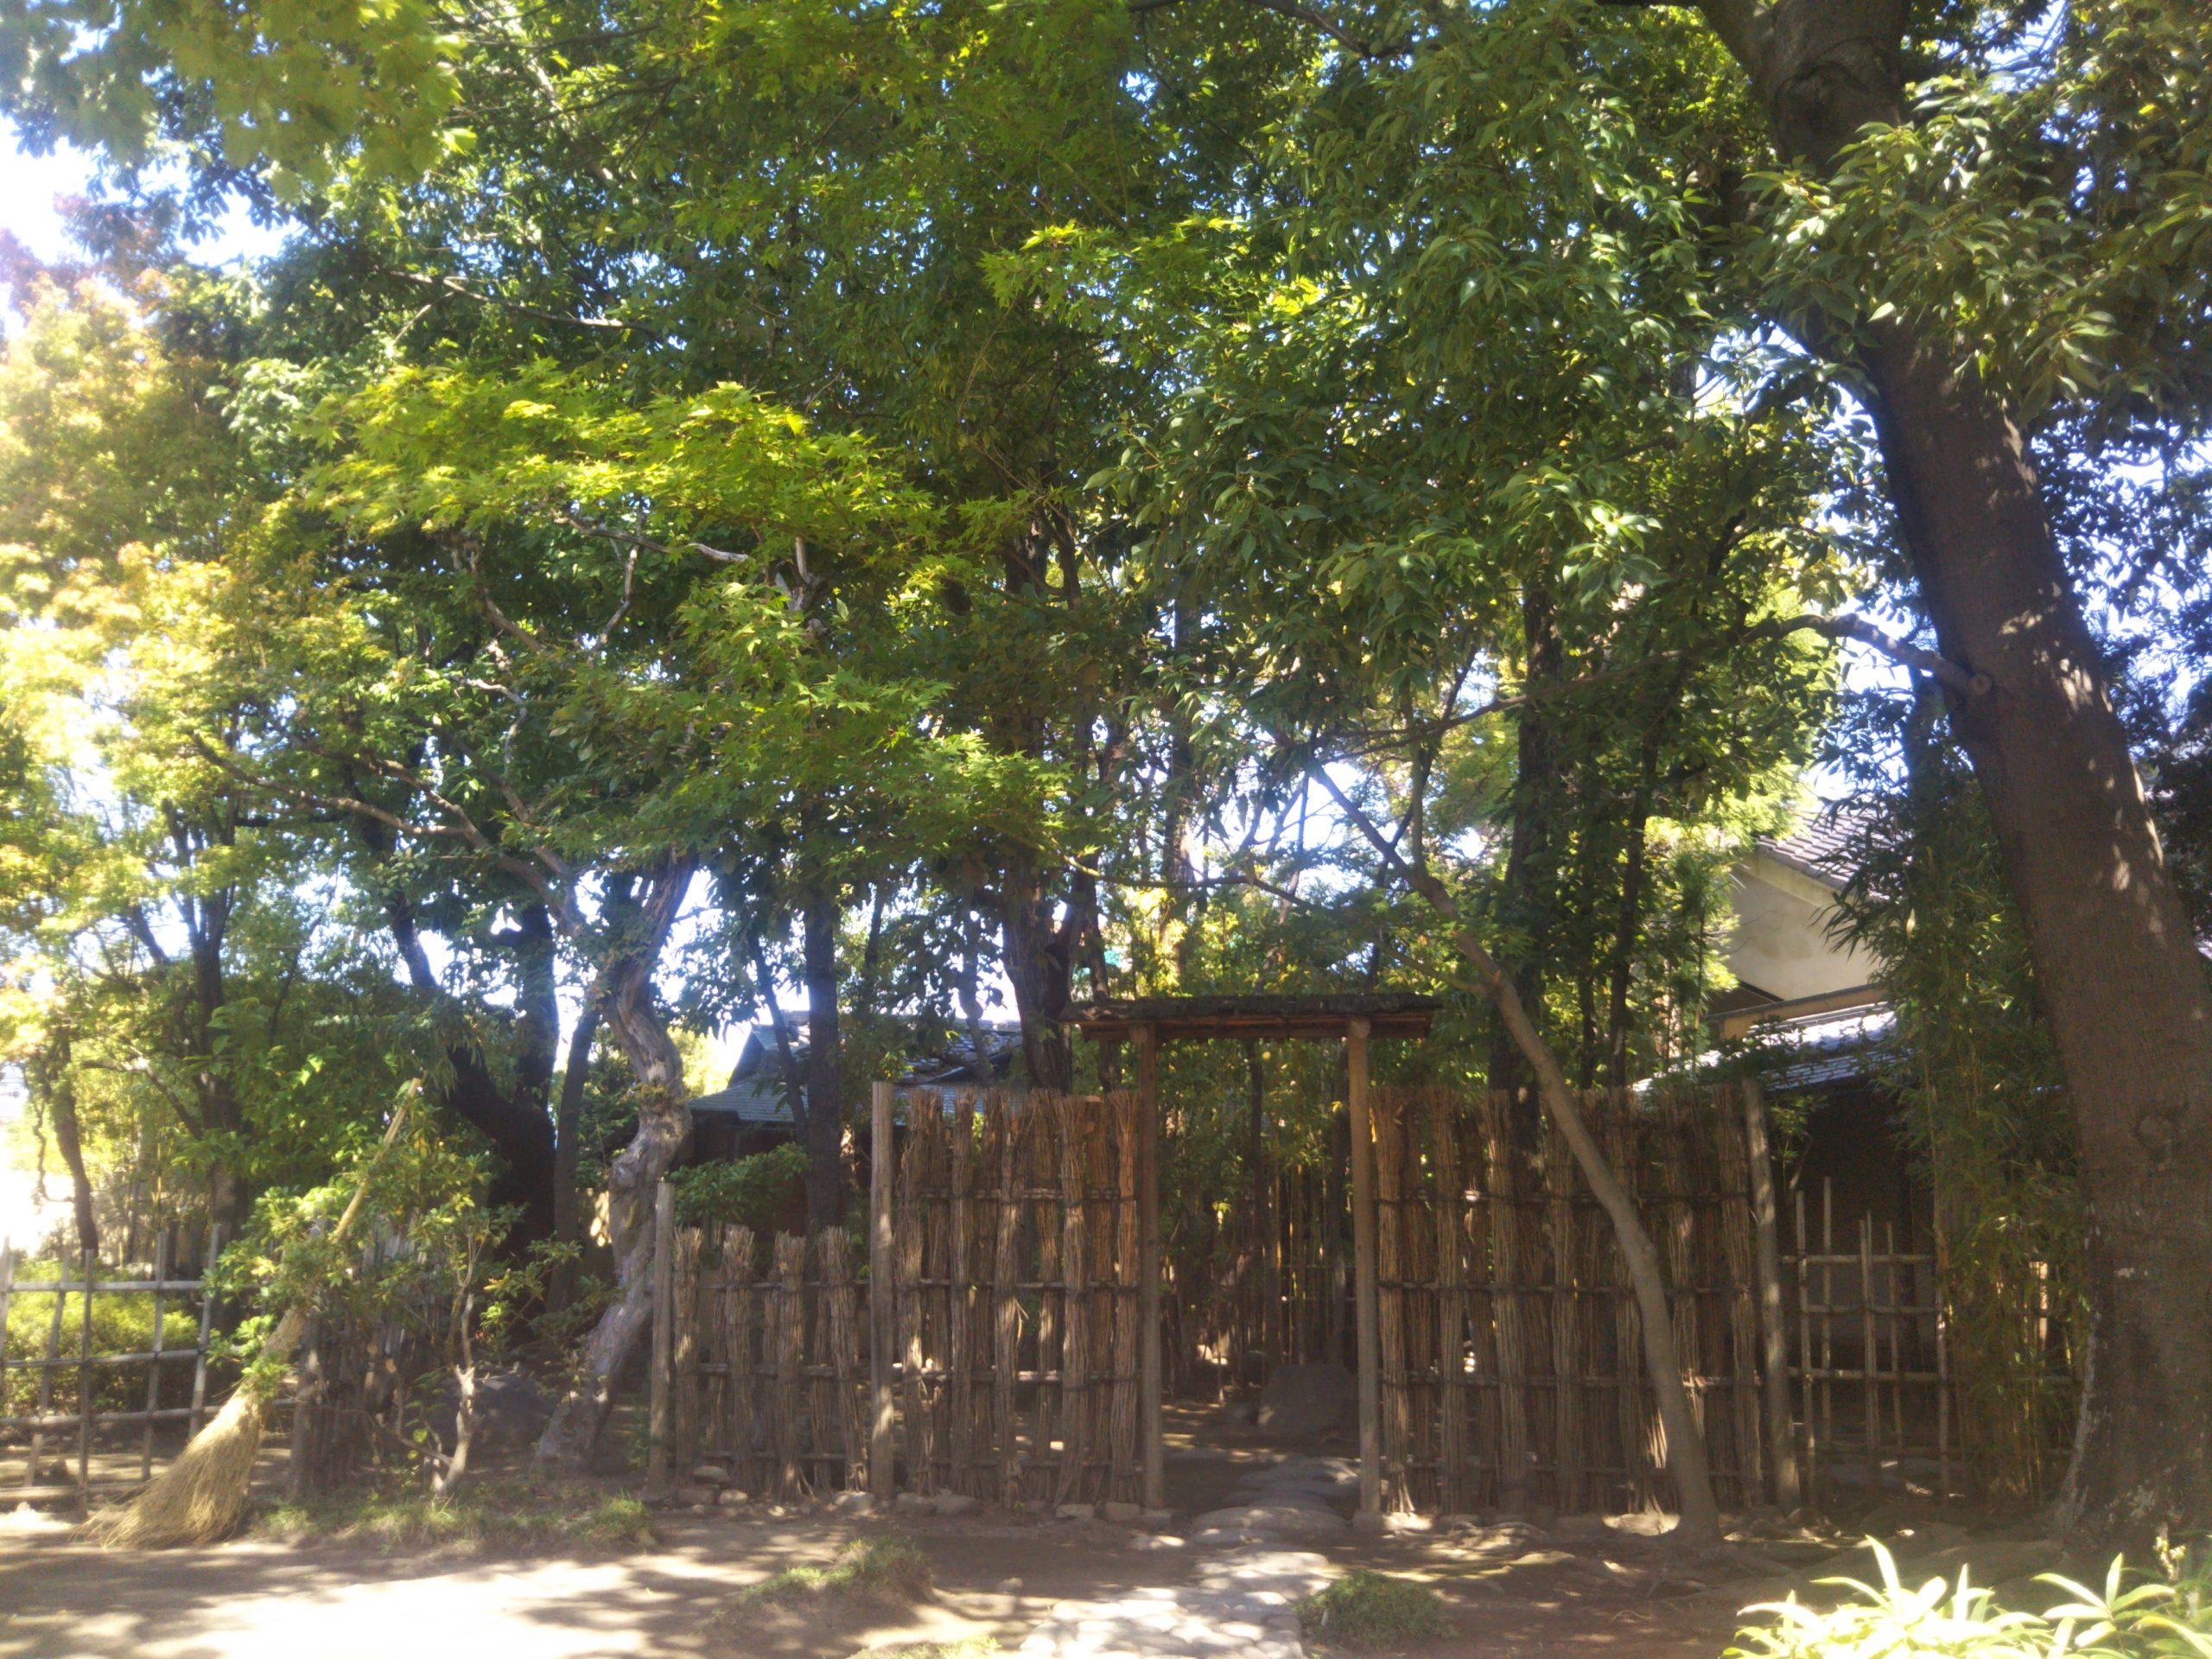 Maison de Thé Ikegami cérémonie